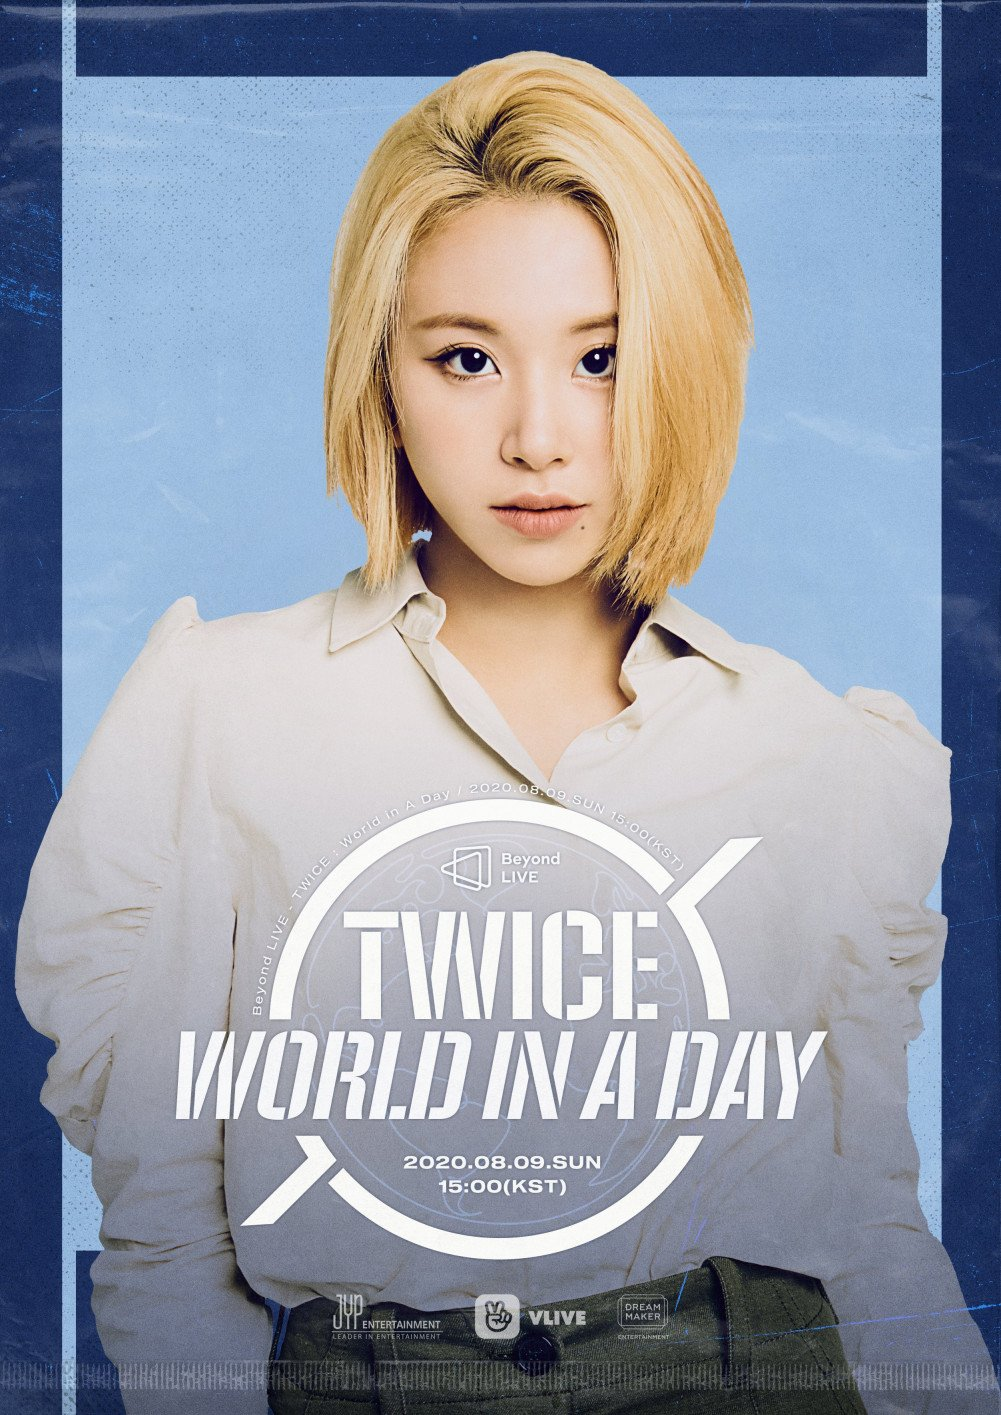 twice-members-teaser-posters-online-concert-2